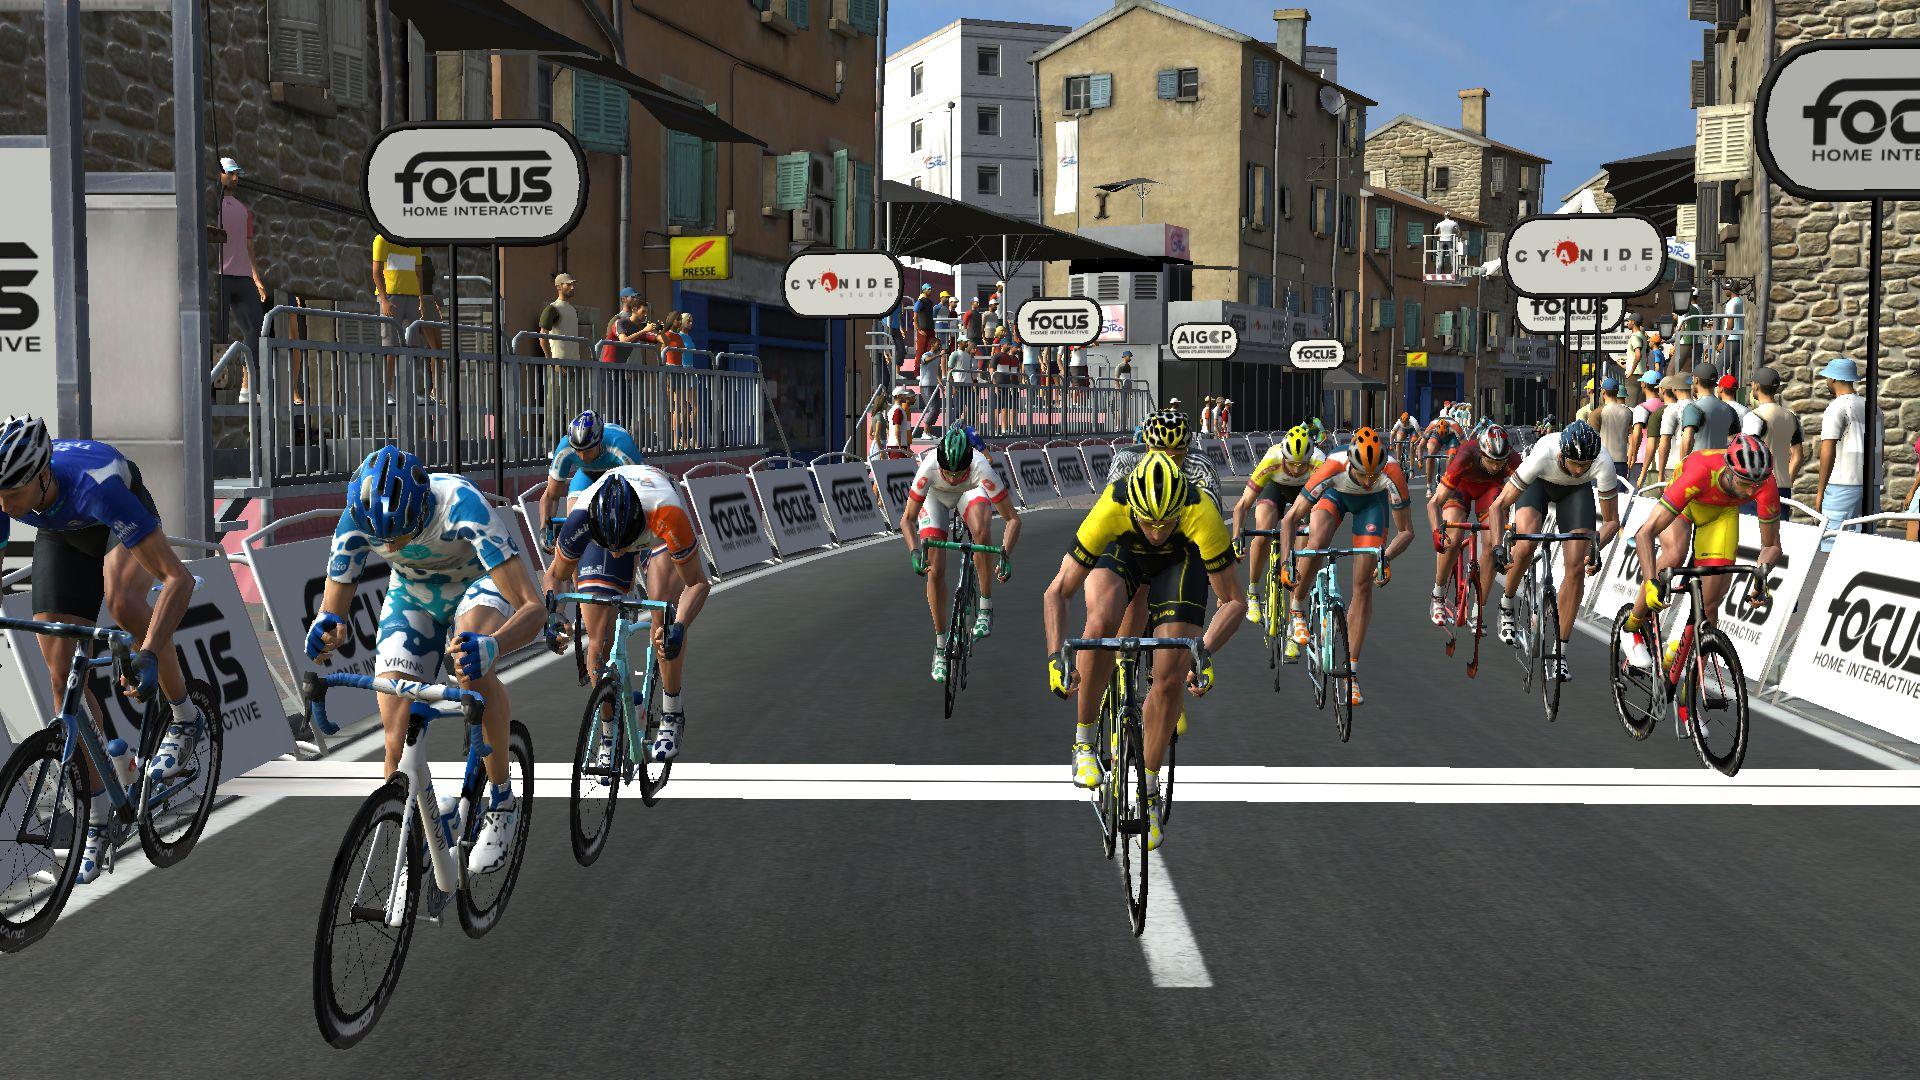 pcmdaily.com/images/mg/2019/Races/GTM/Giro/mg19_giro_10_PCM0145.jpg